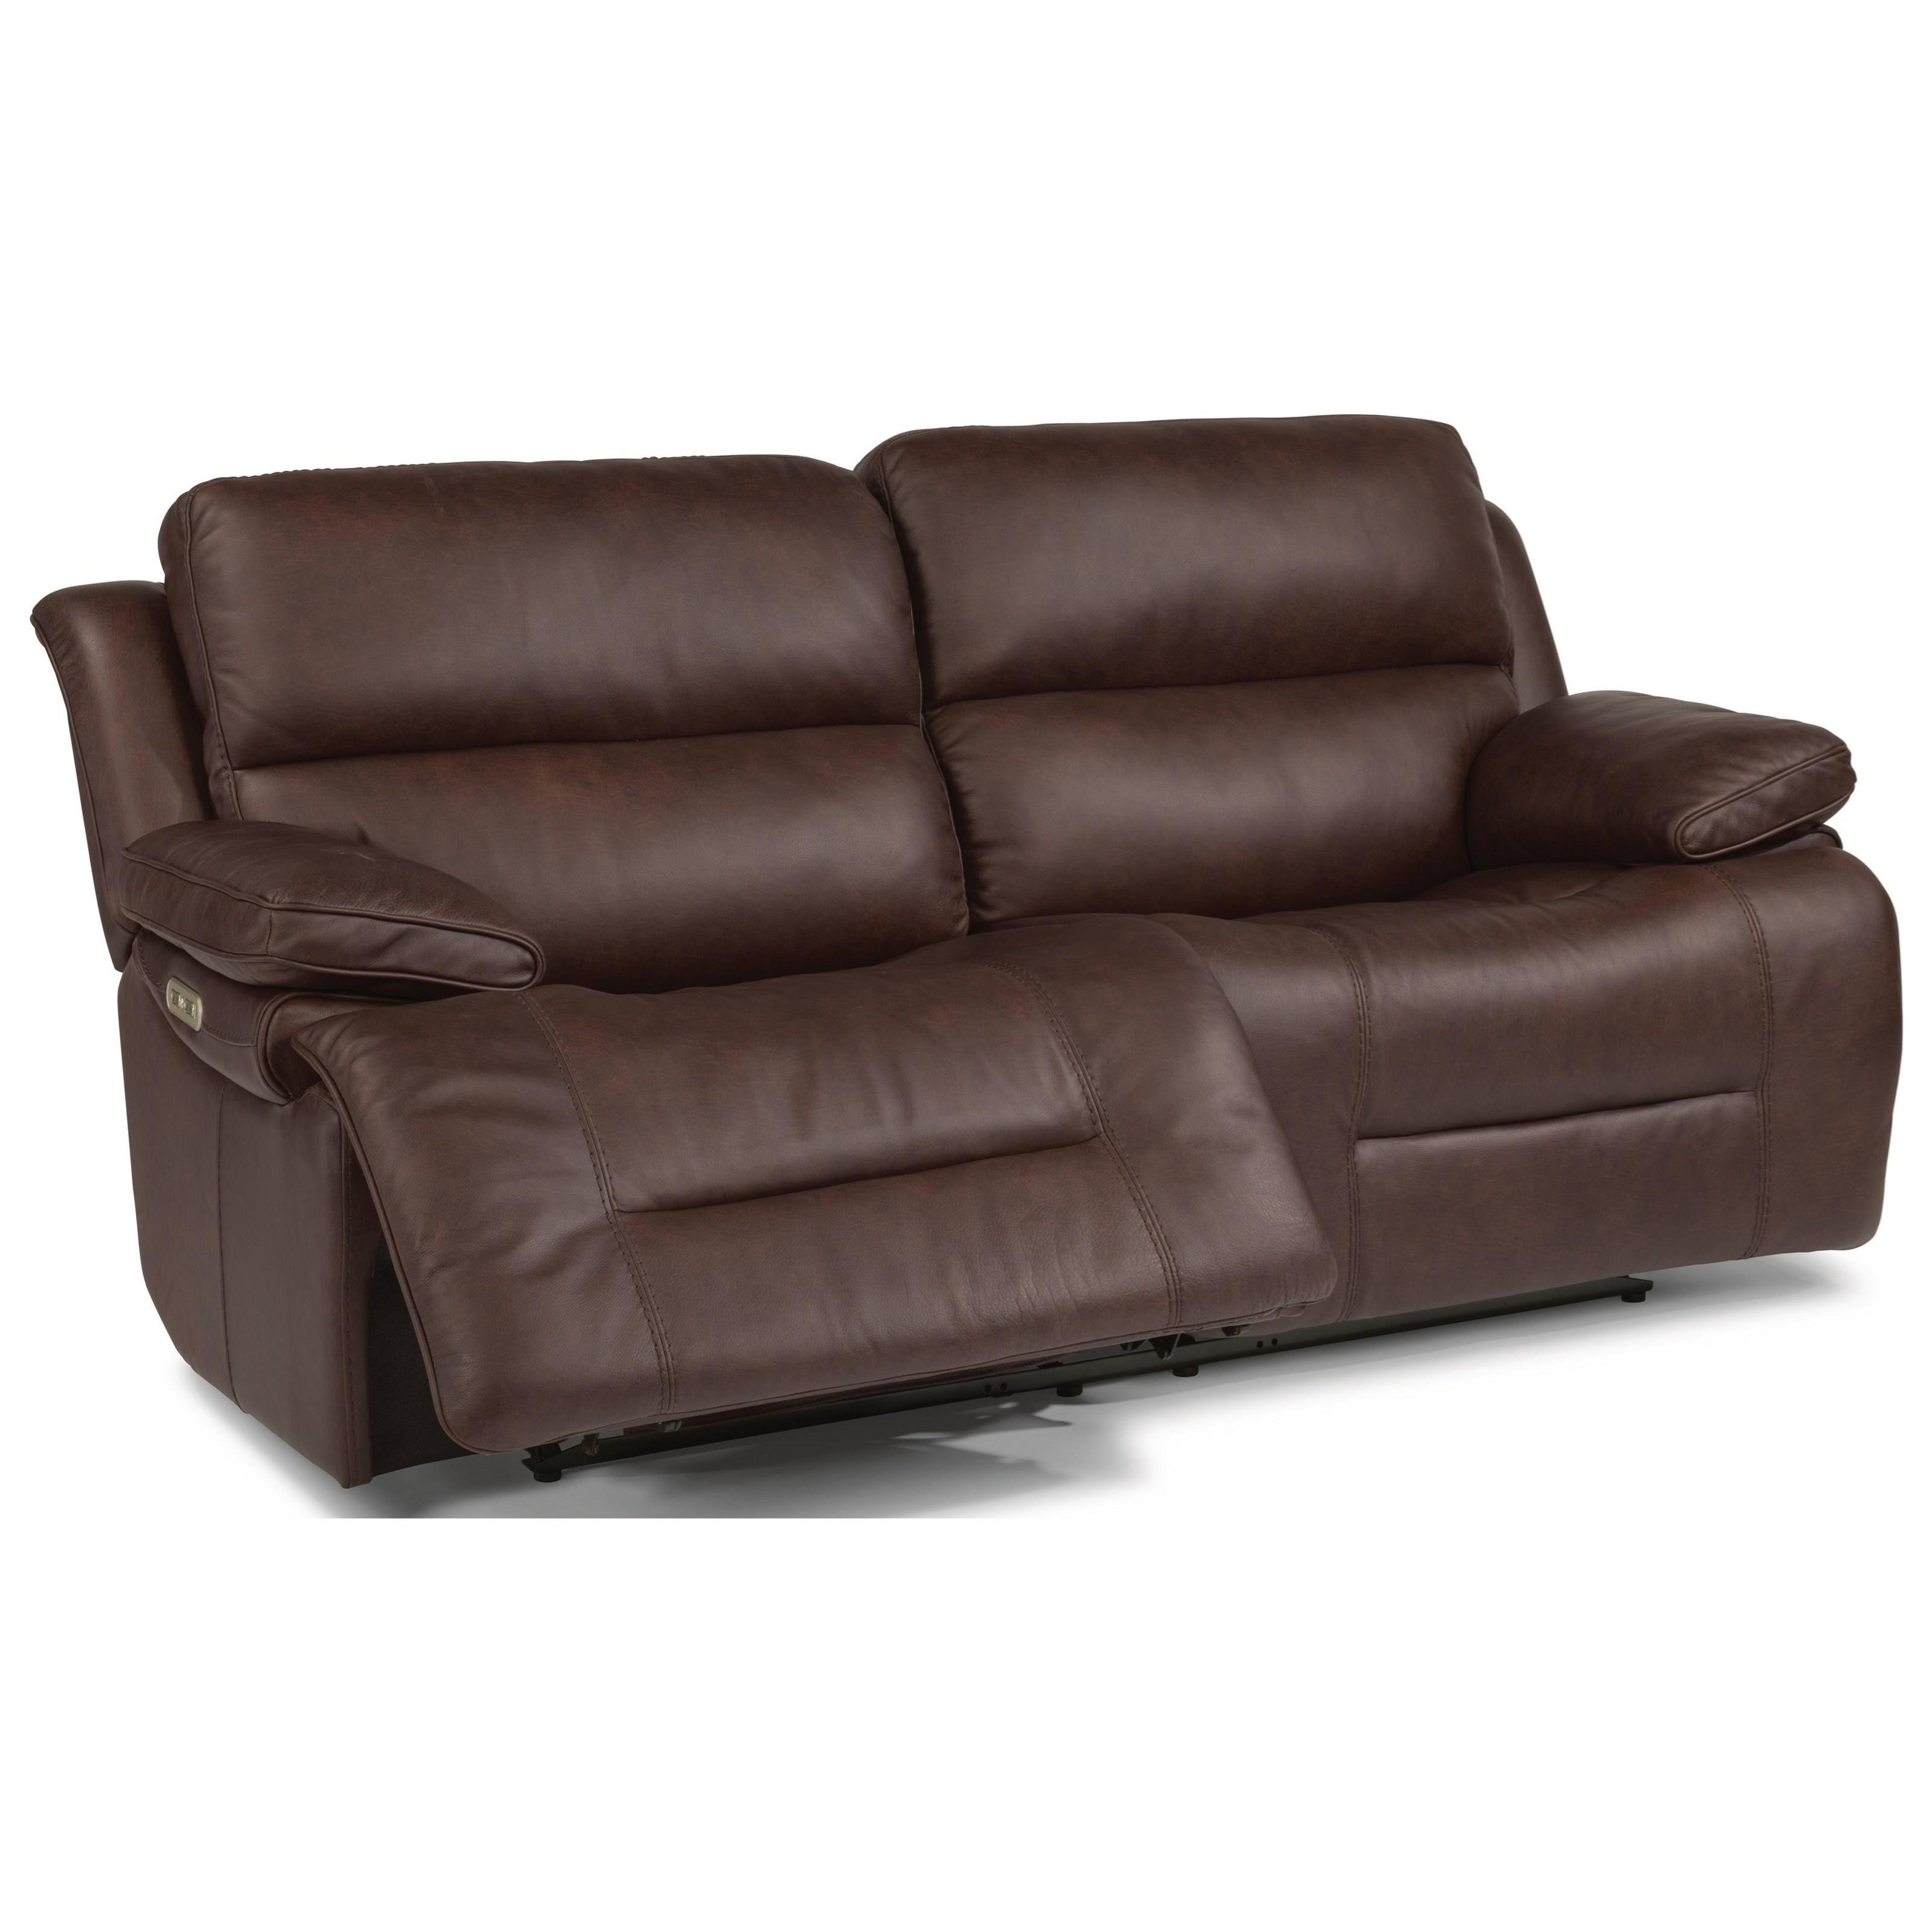 Flexsteel Apollo Casual Power Reclining Sofa With Power